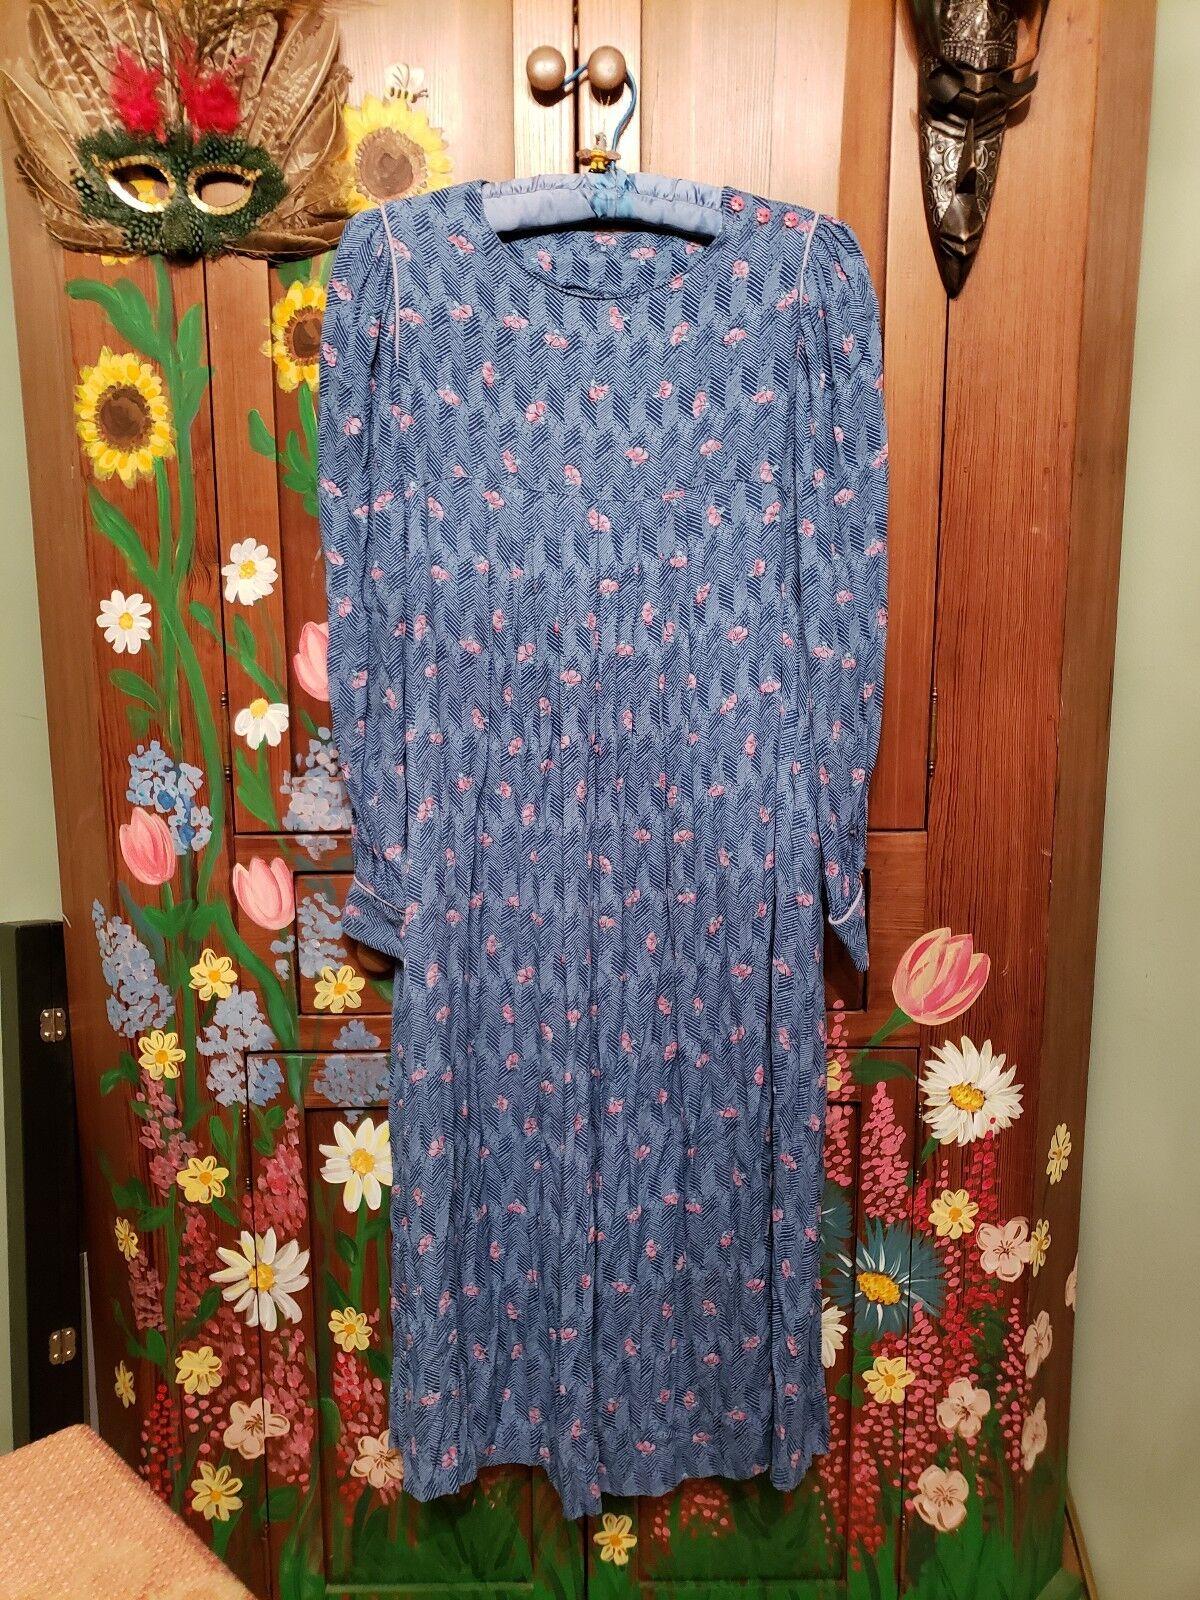 VINTAGE Floral Print Dress JANE SCHAFFHAUSEN bluee Pink SIZE